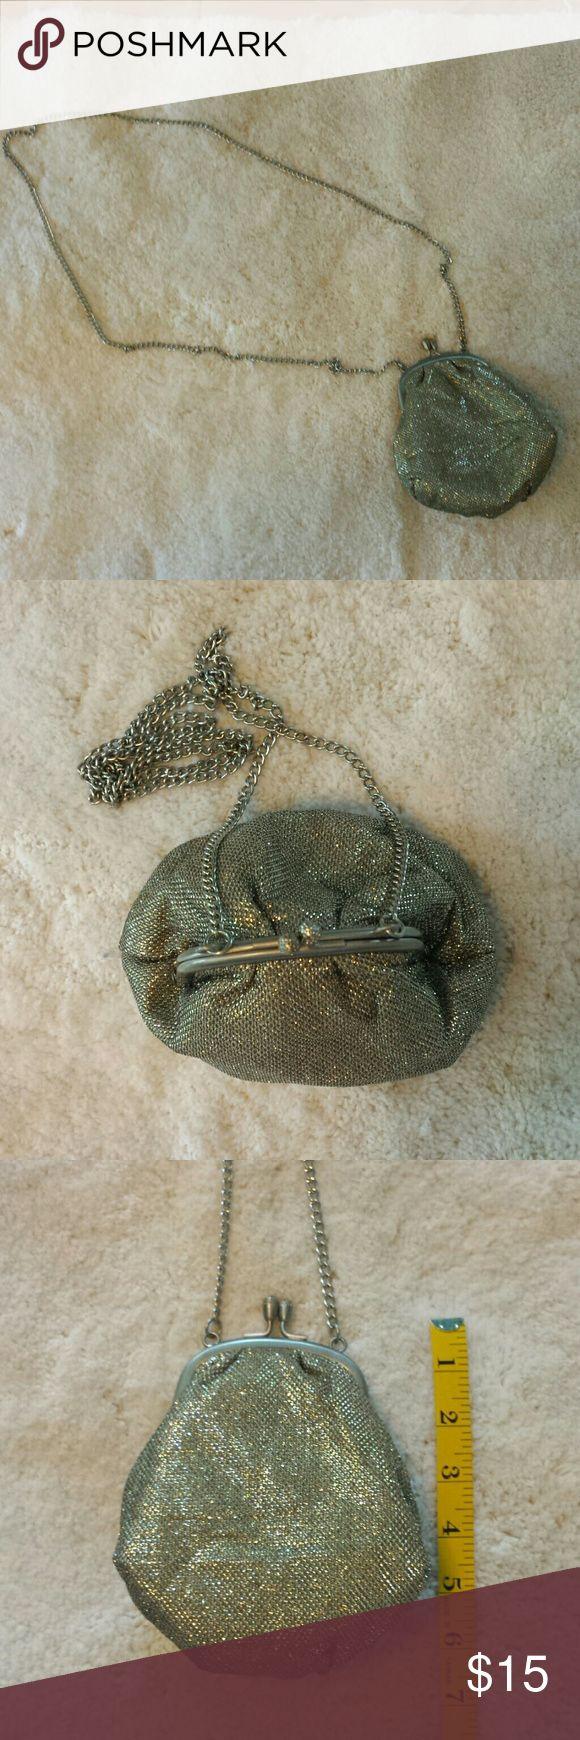 "Sparkling Gold - Silver Purse Sparkling Gold - Silver Purse.  24"" drop. Bags"